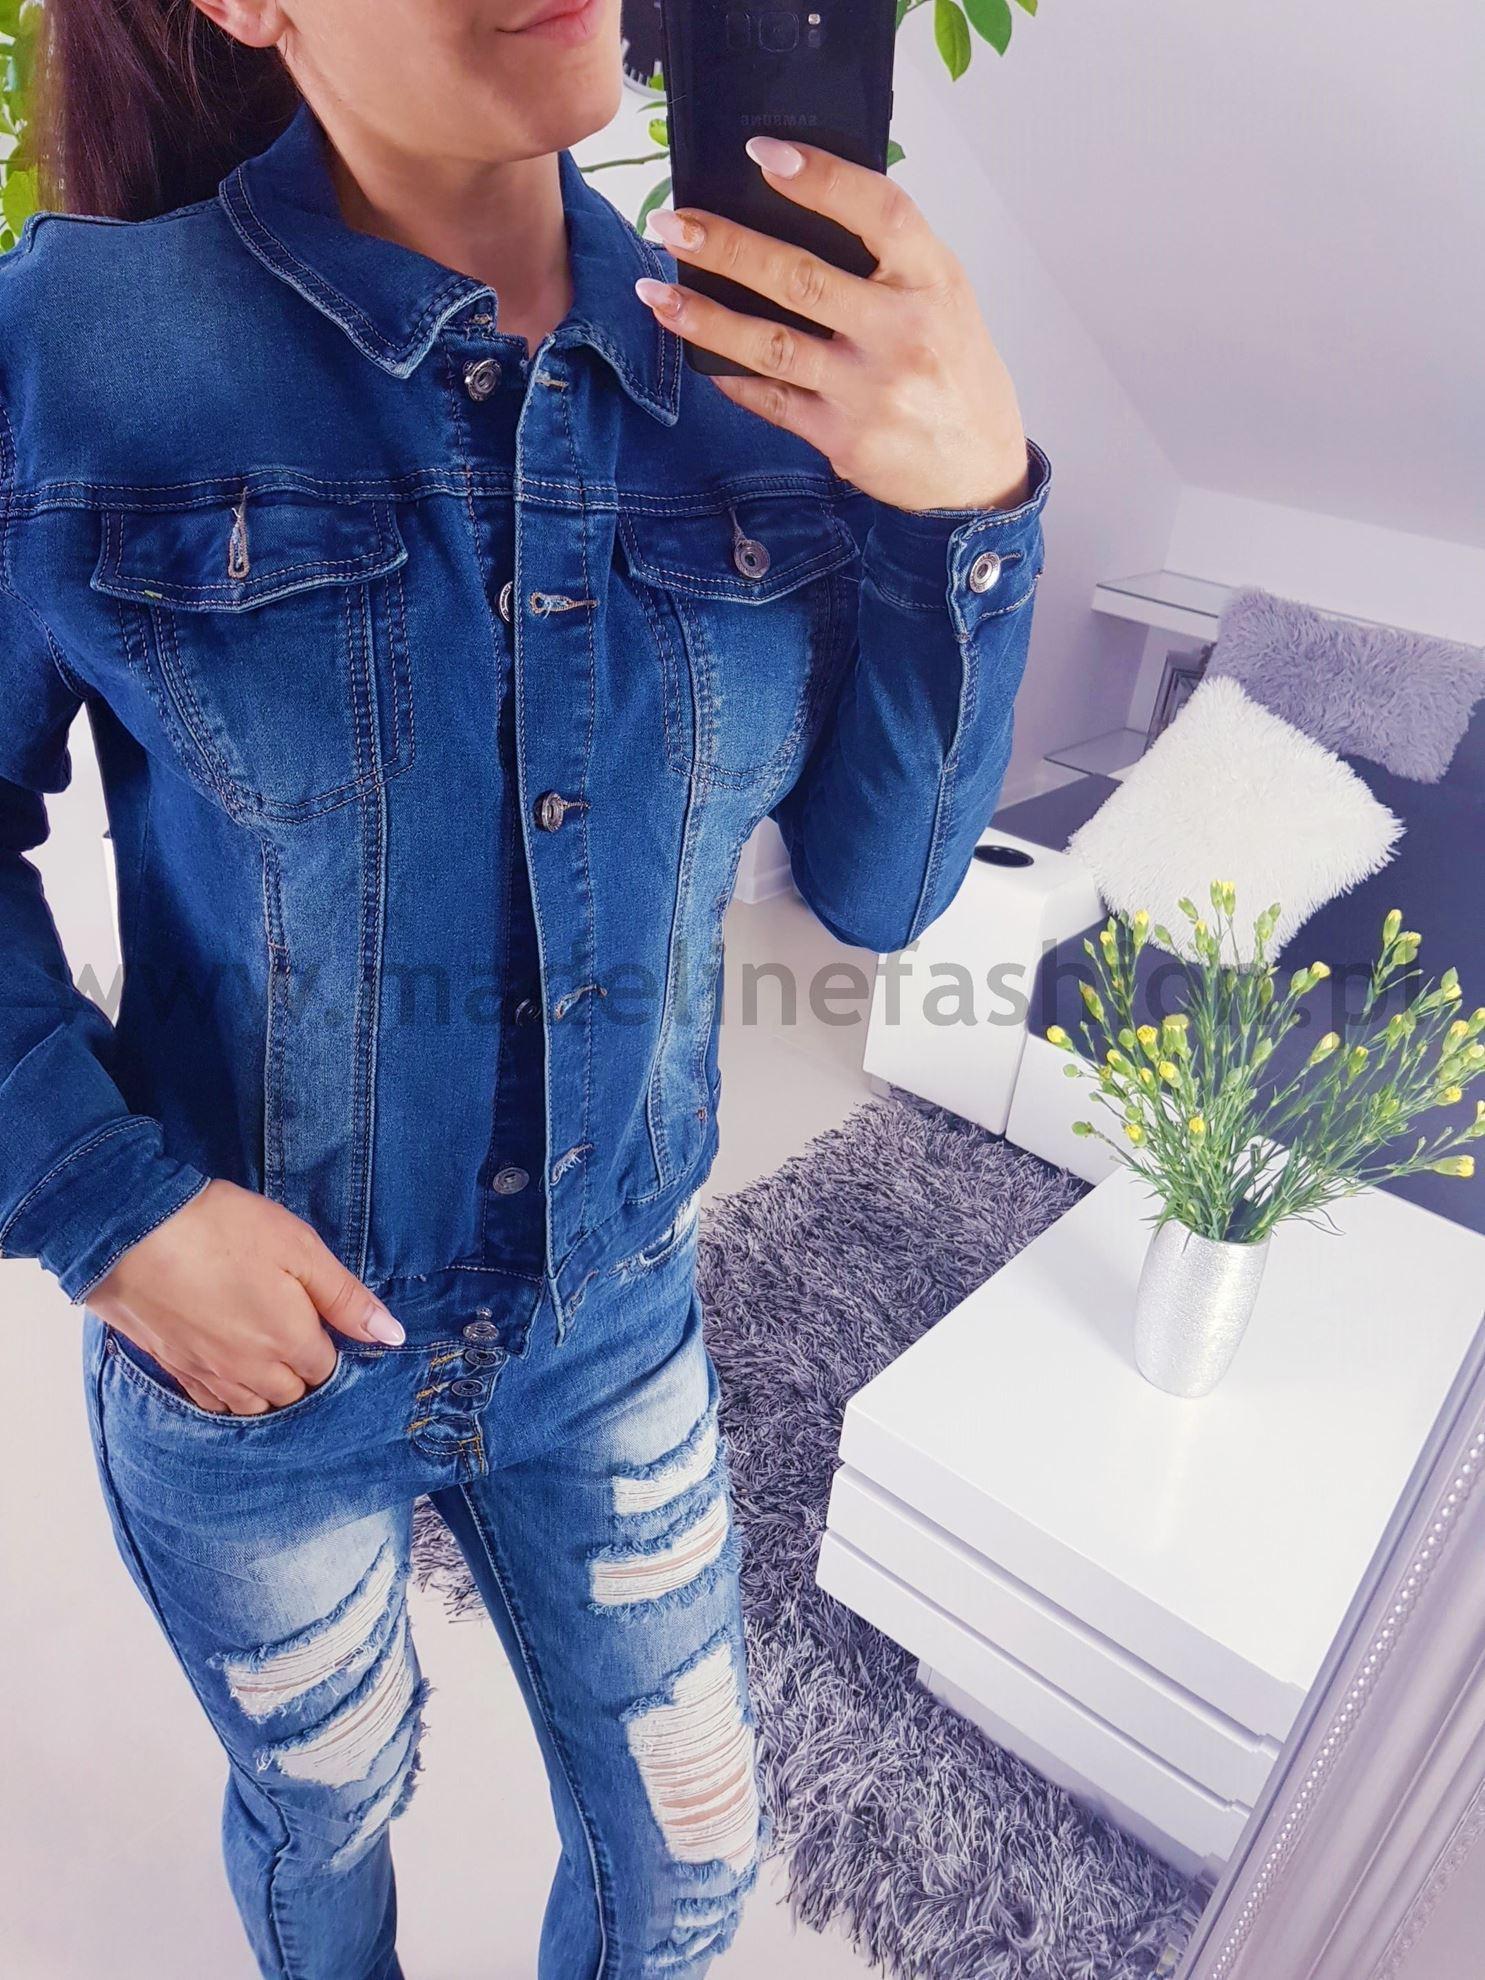 products 0003735 kurtka jeans vivo 1